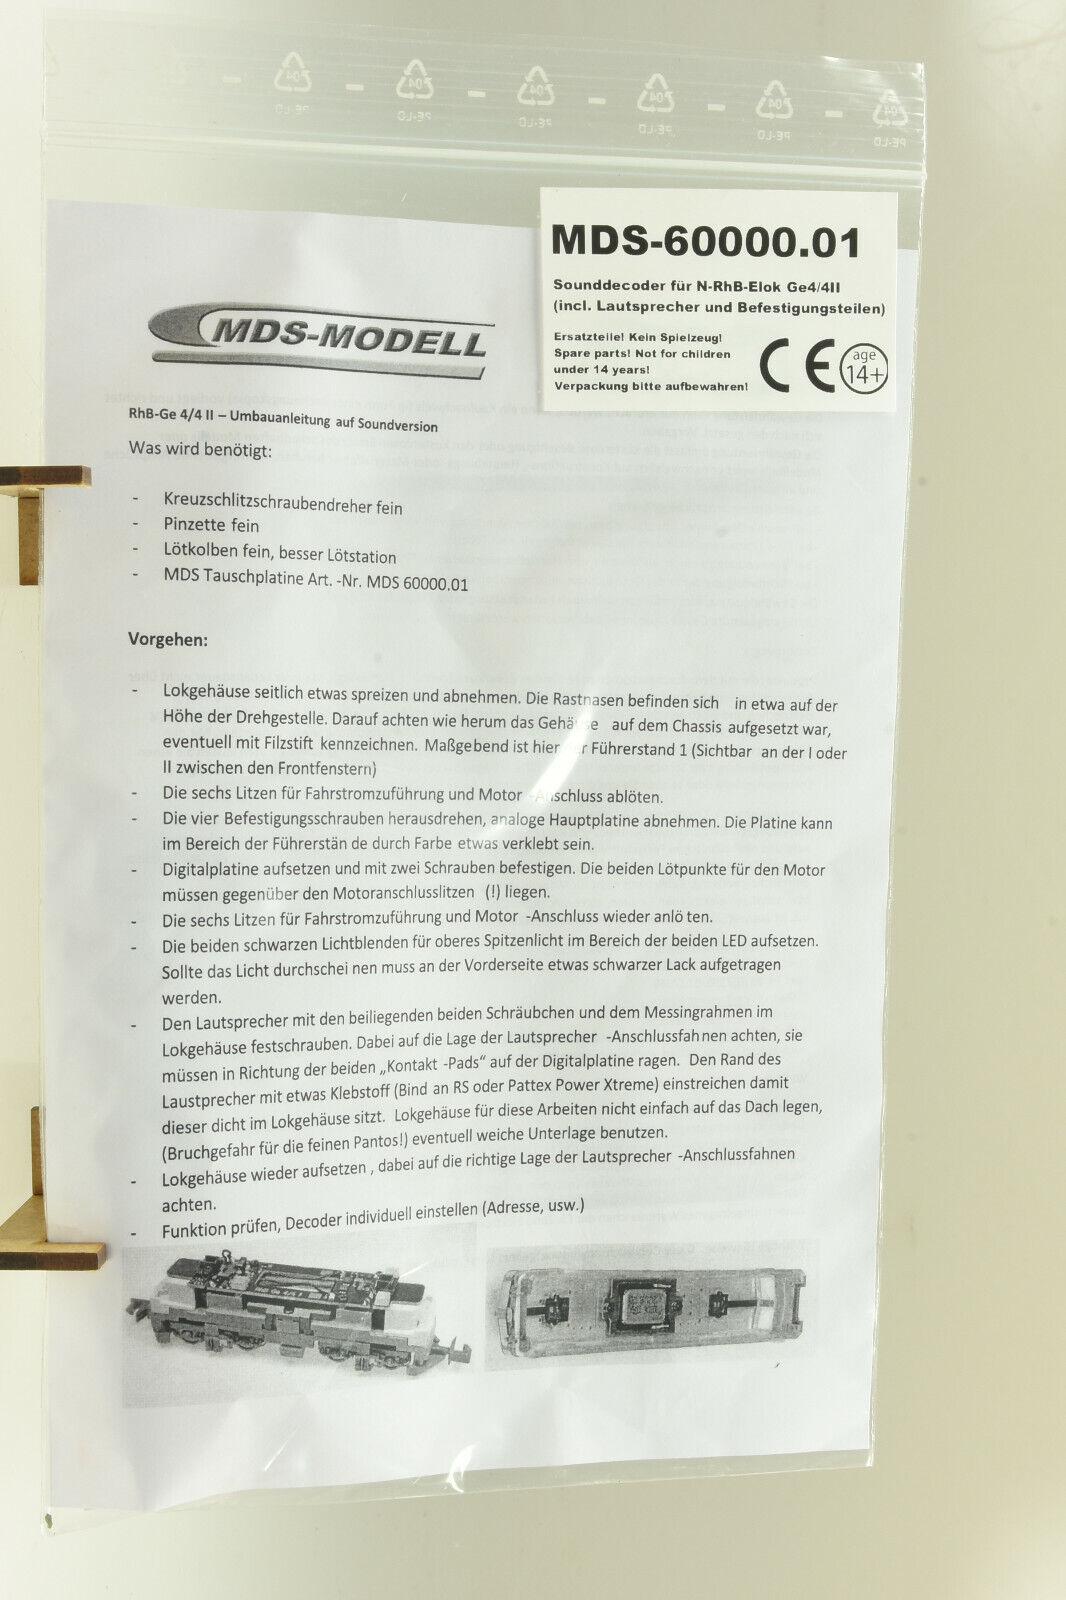 MDS-modelo 60000.01 pista n intercambio placa DCC mm Sound onboard RHB elok ge4 4ii